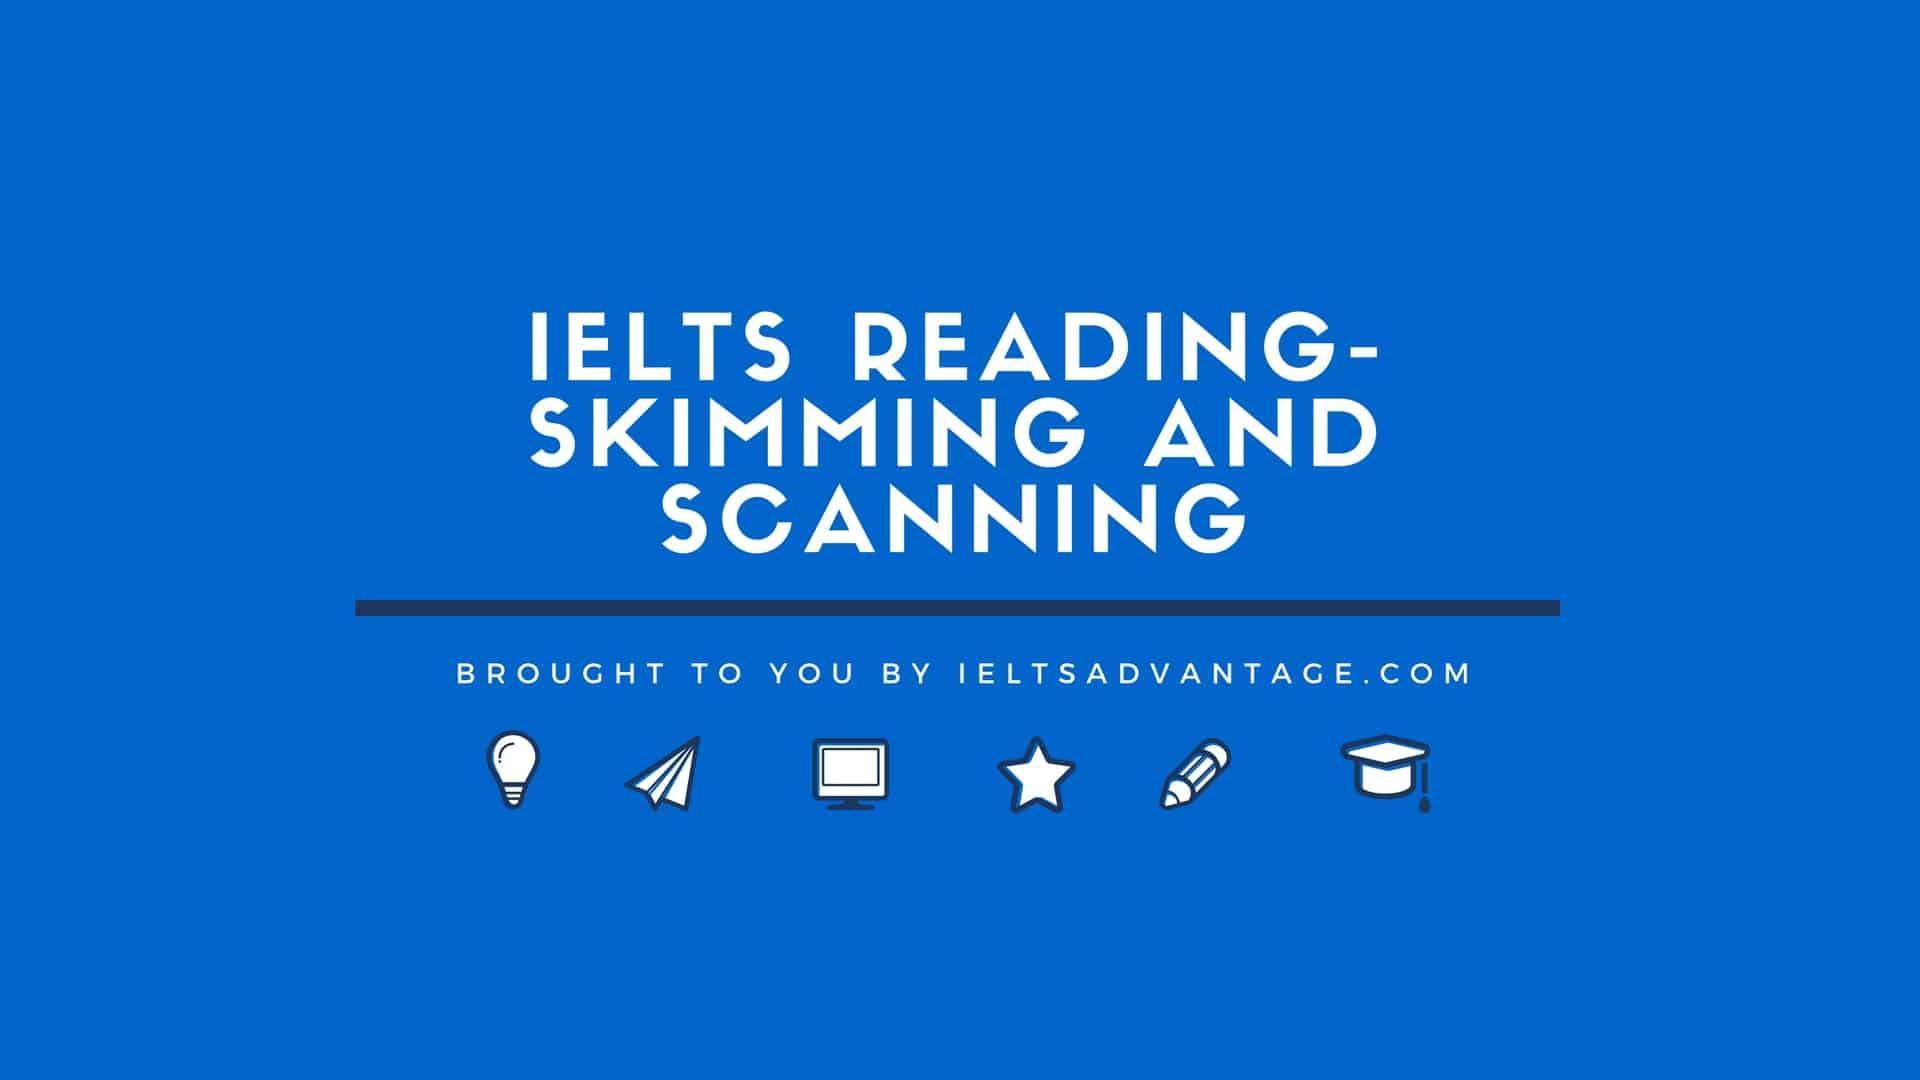 Ielts Reading Skimming And Scanning Ielts Advantage